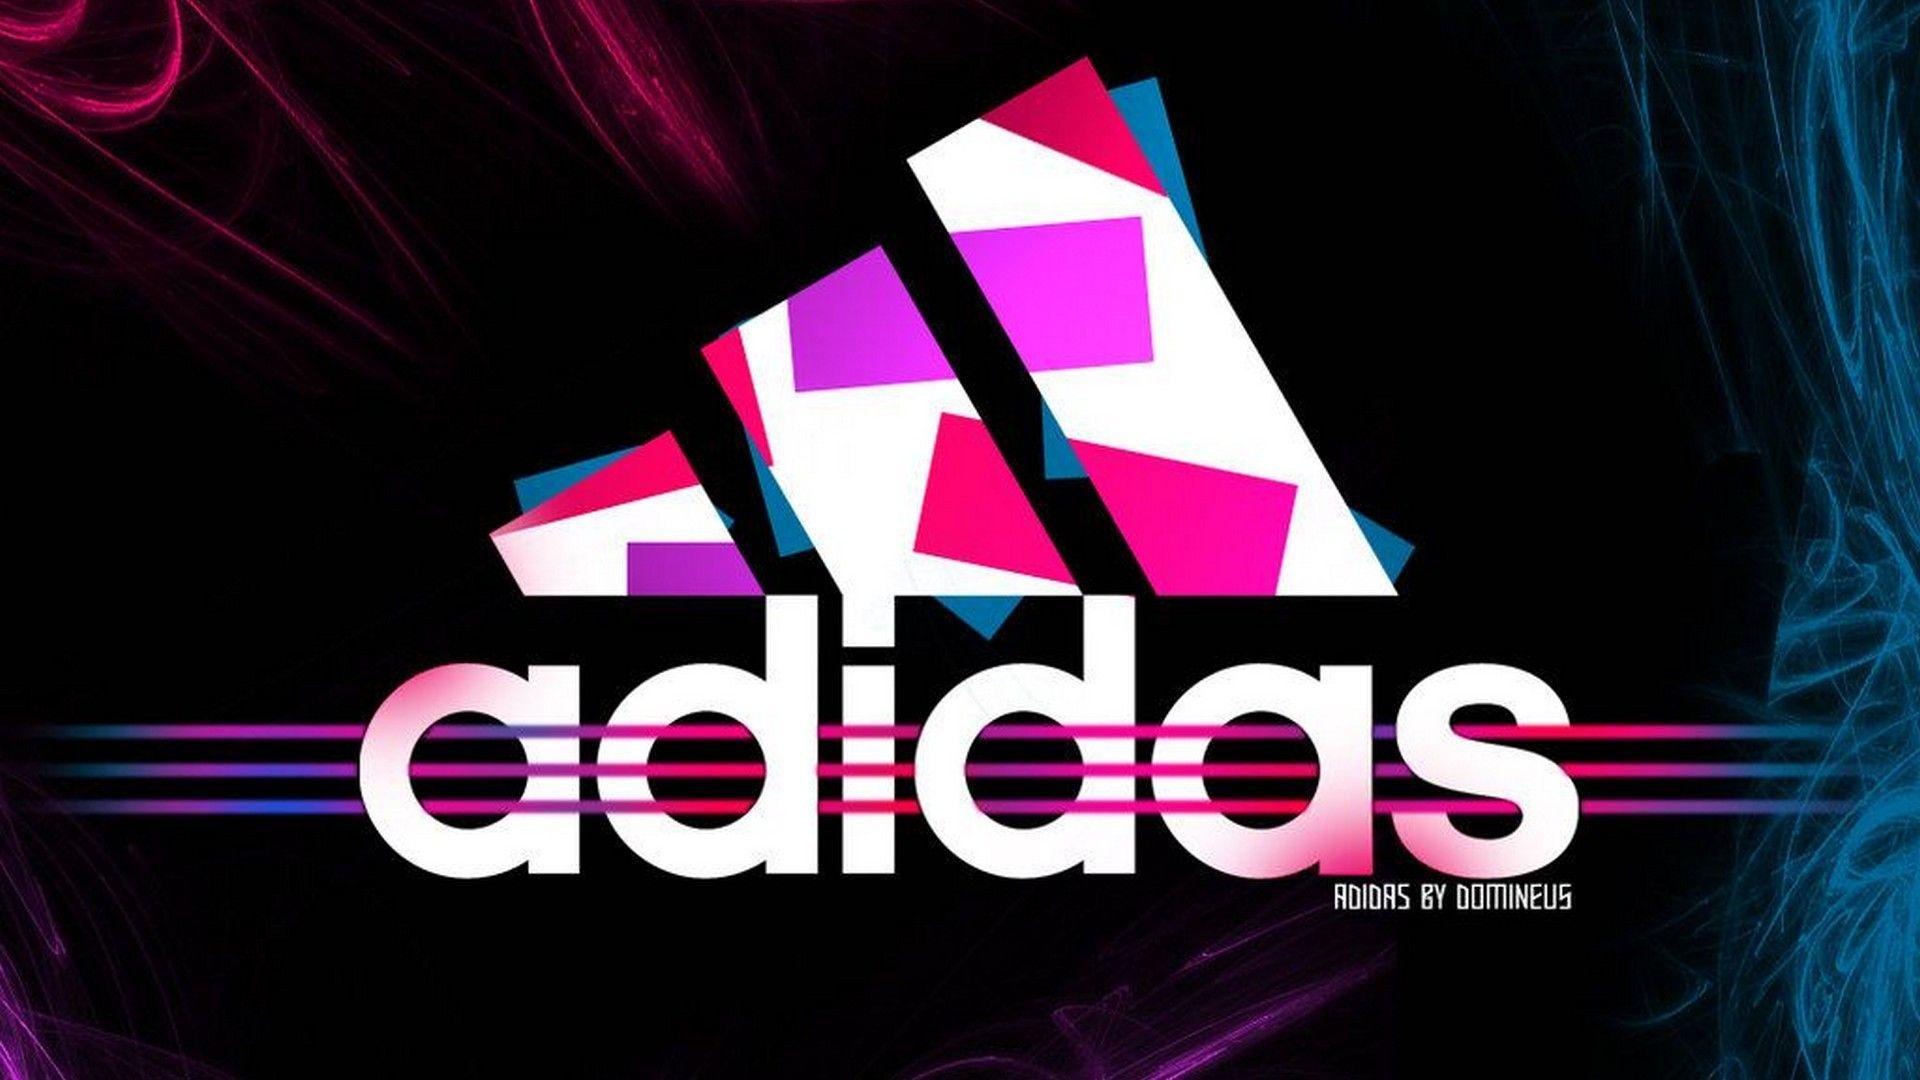 Adidas Desktop Backgrounds 2021 Live Wallpaper Hd Backgrounds Desktop Hd Wallpapers For Laptop Adidas Wallpapers